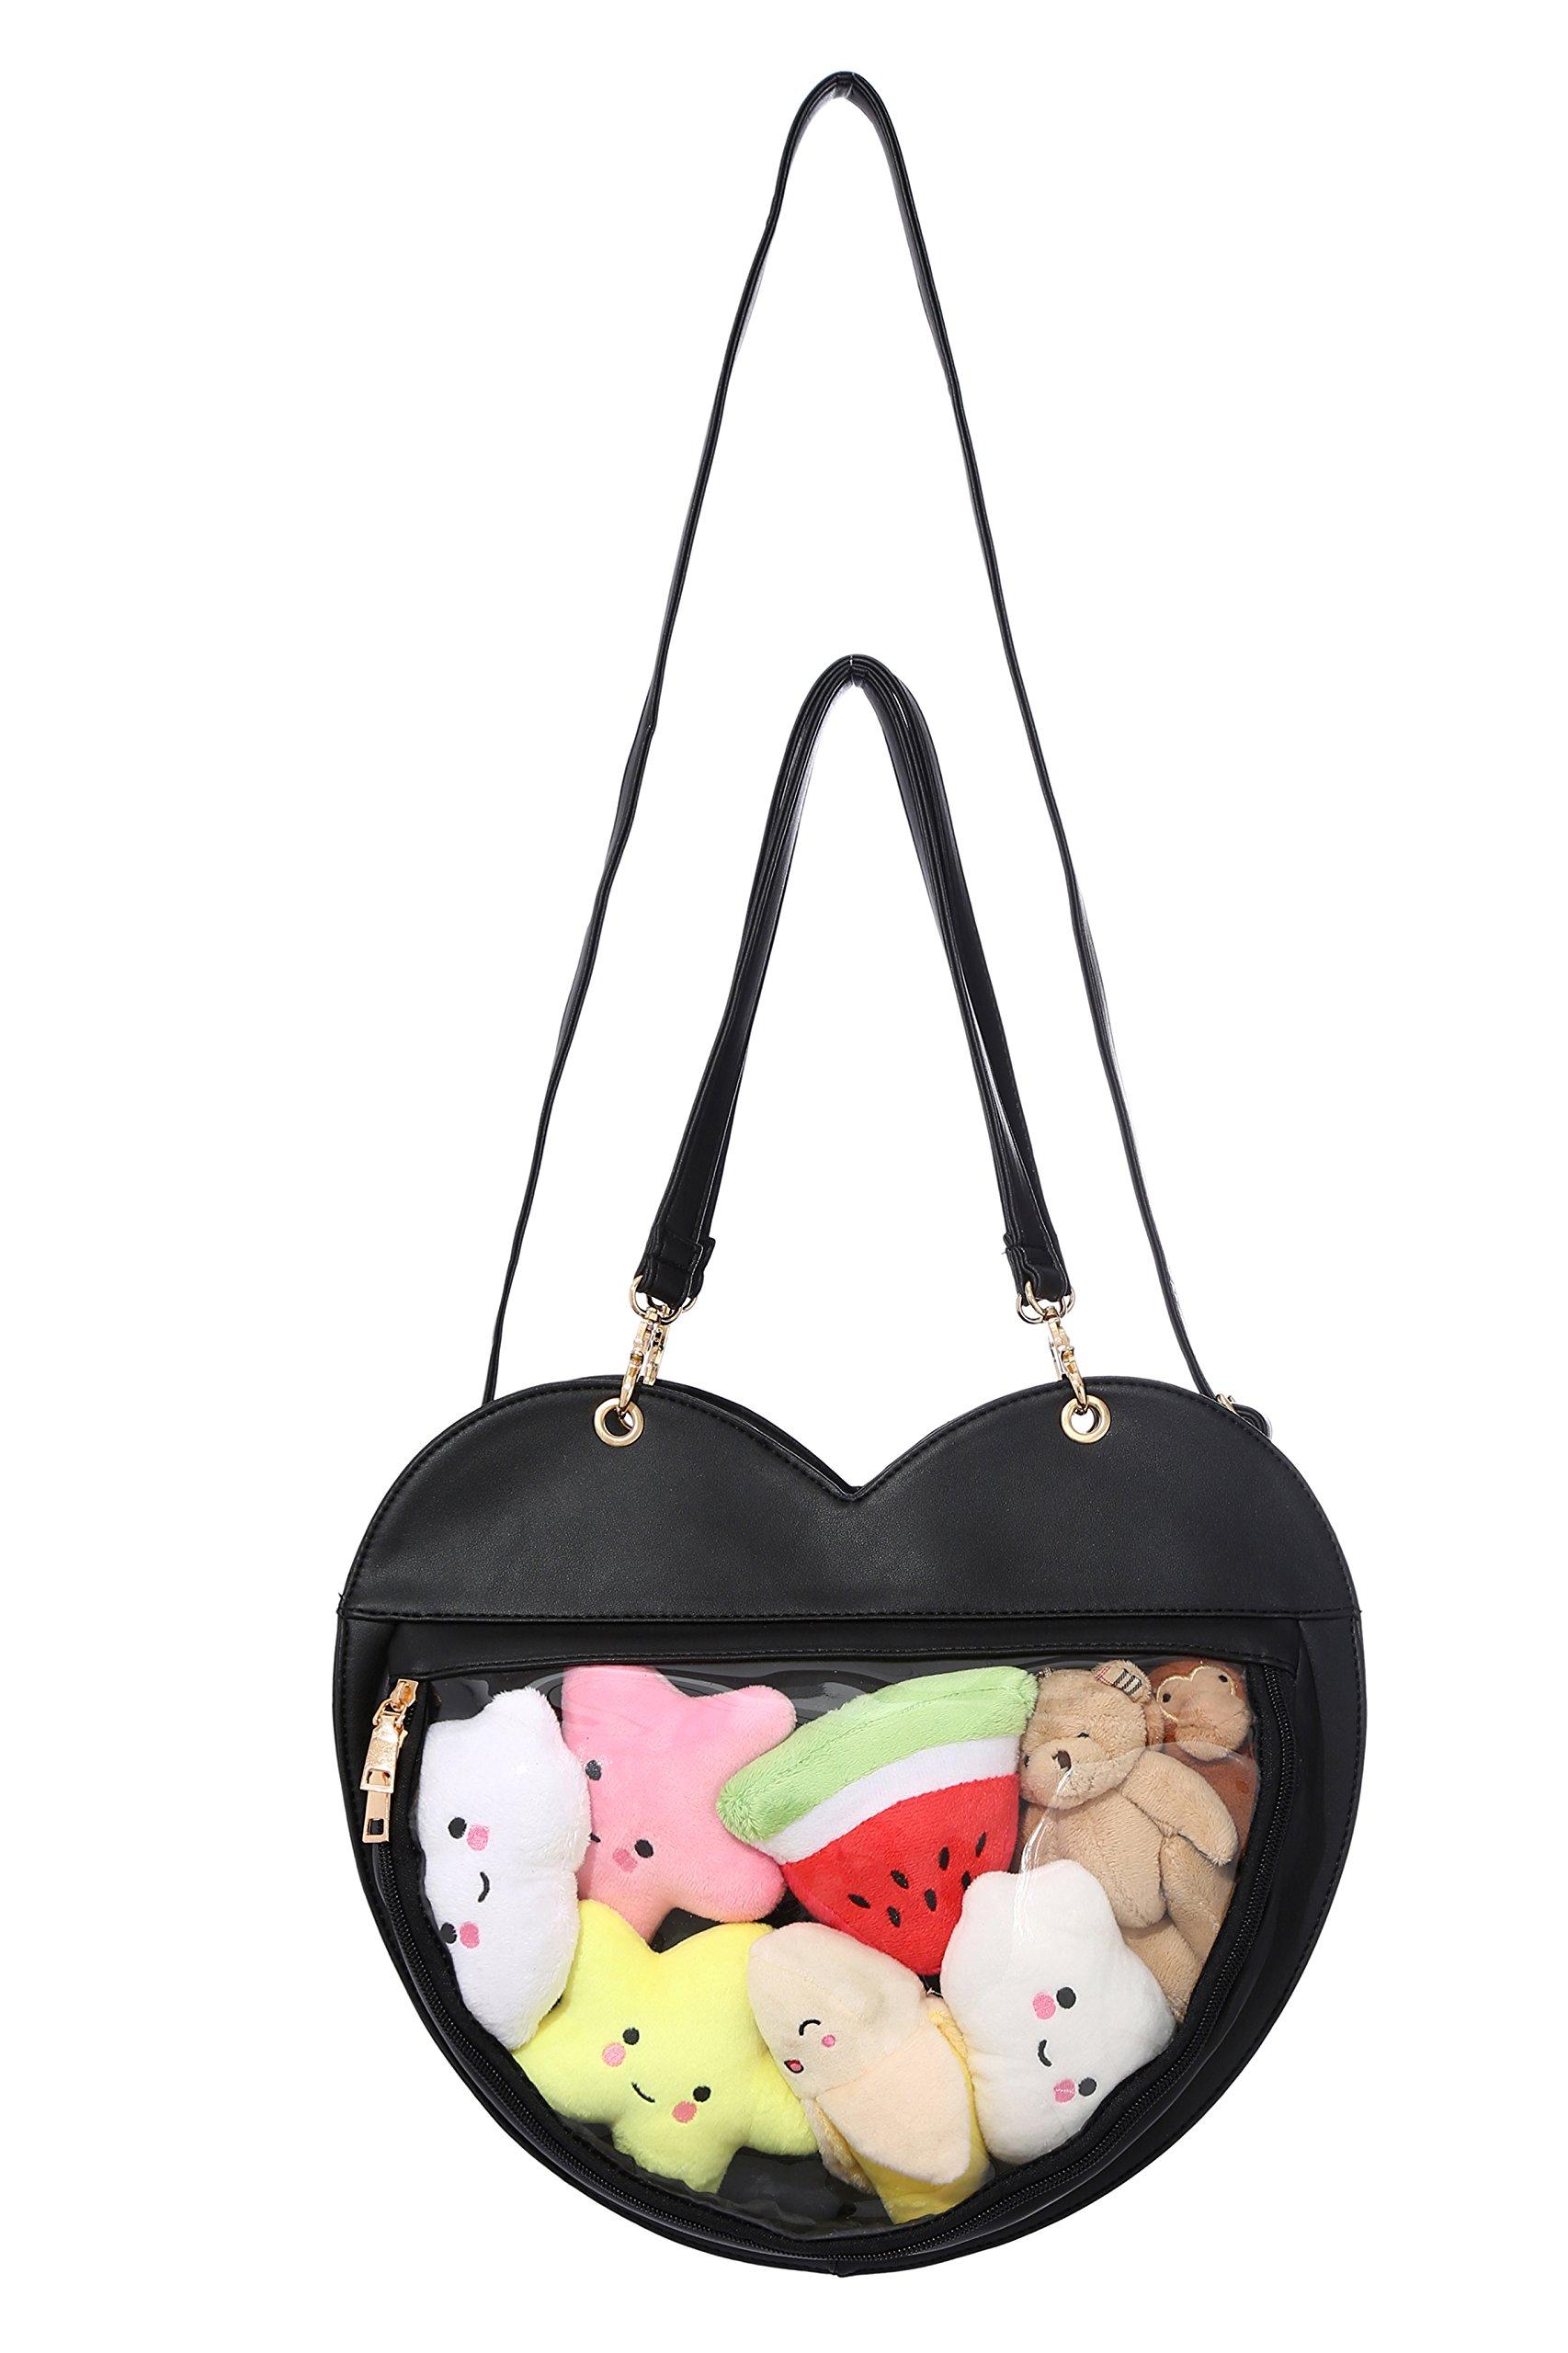 Clear Candy Leather Handbag Kawaii Purse Transparent Backpacks Love Heart Shape Crossbody Bags Lolita Ita Bag